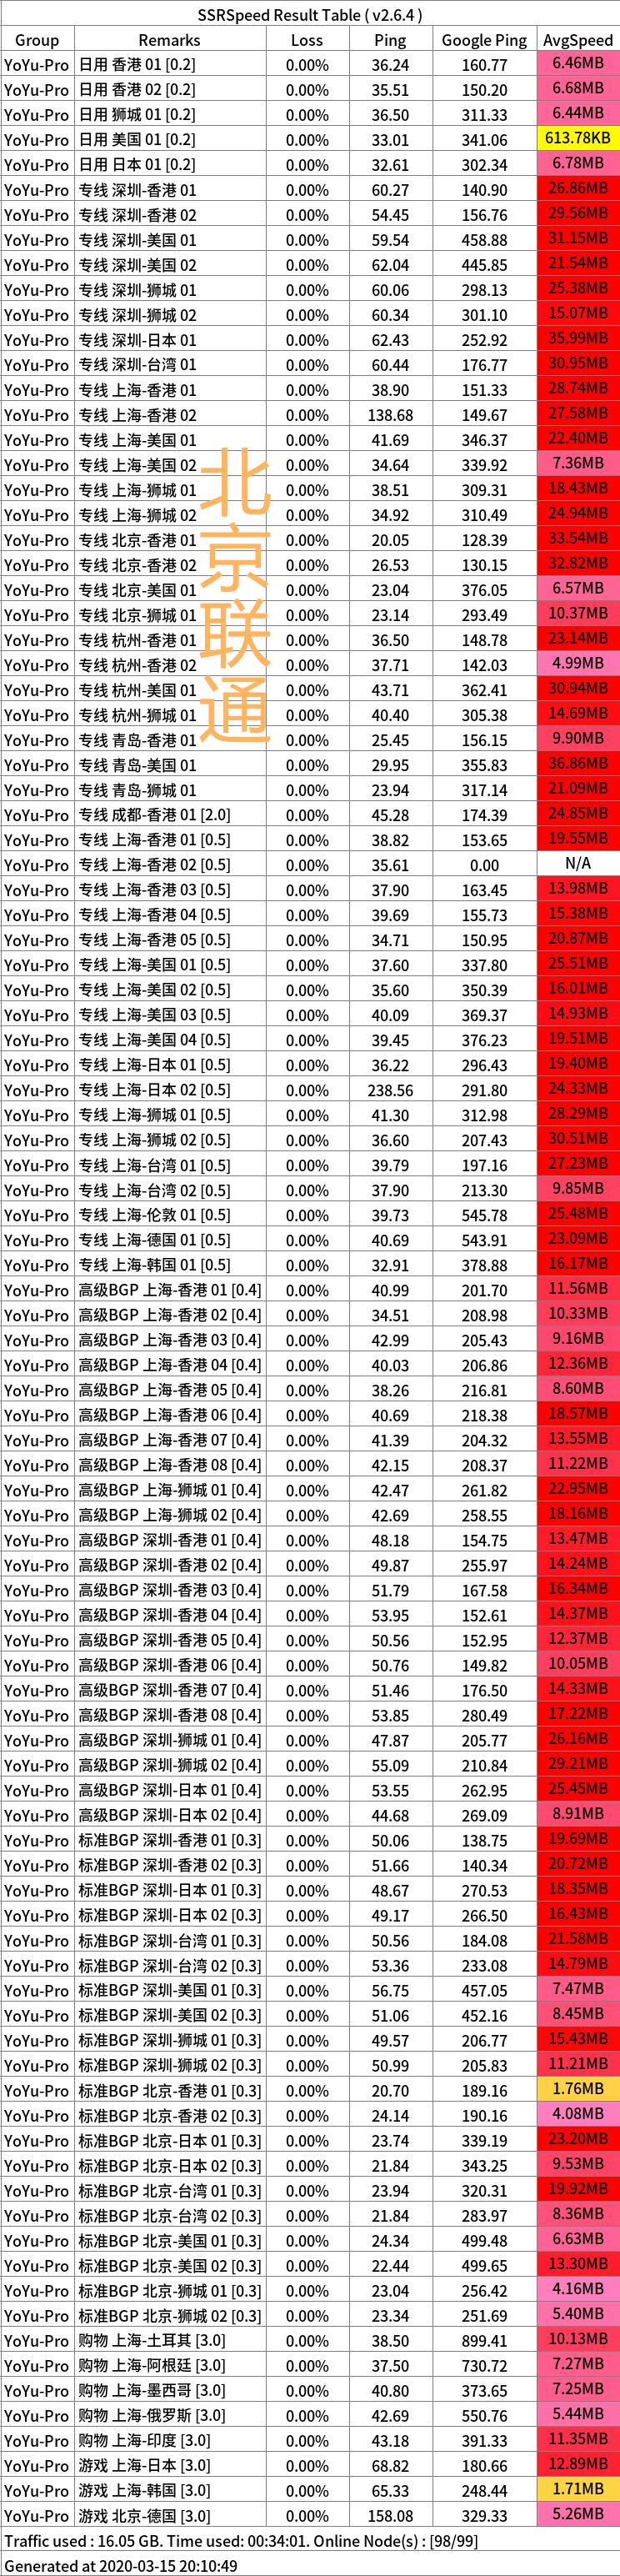 YoYu 03 15 联通_副本